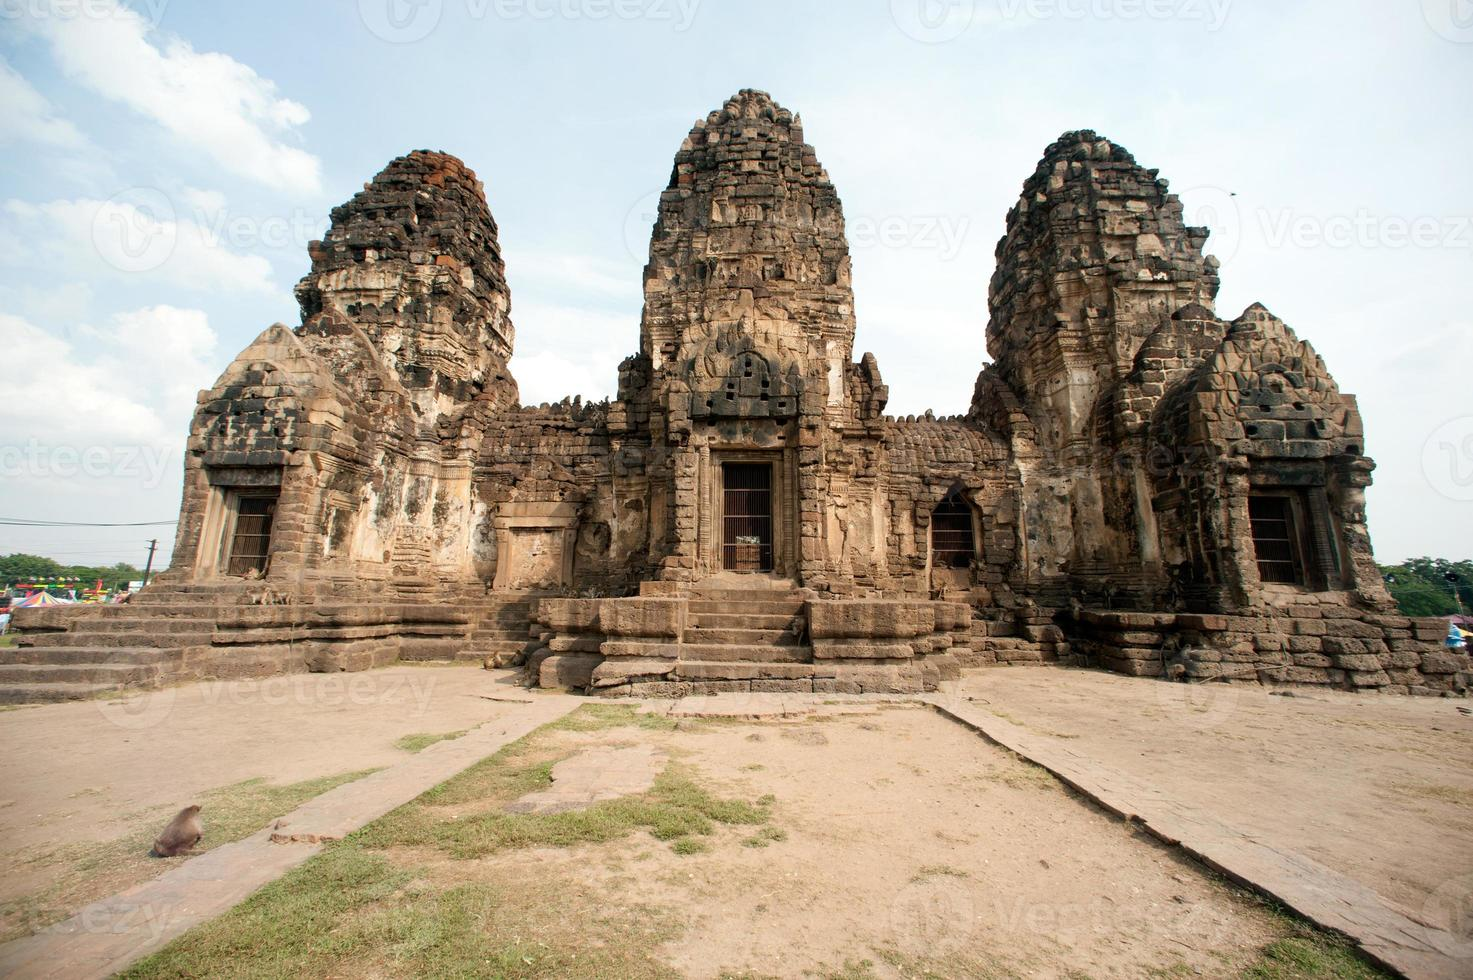 phra prang sam yod temple in thailandia. foto